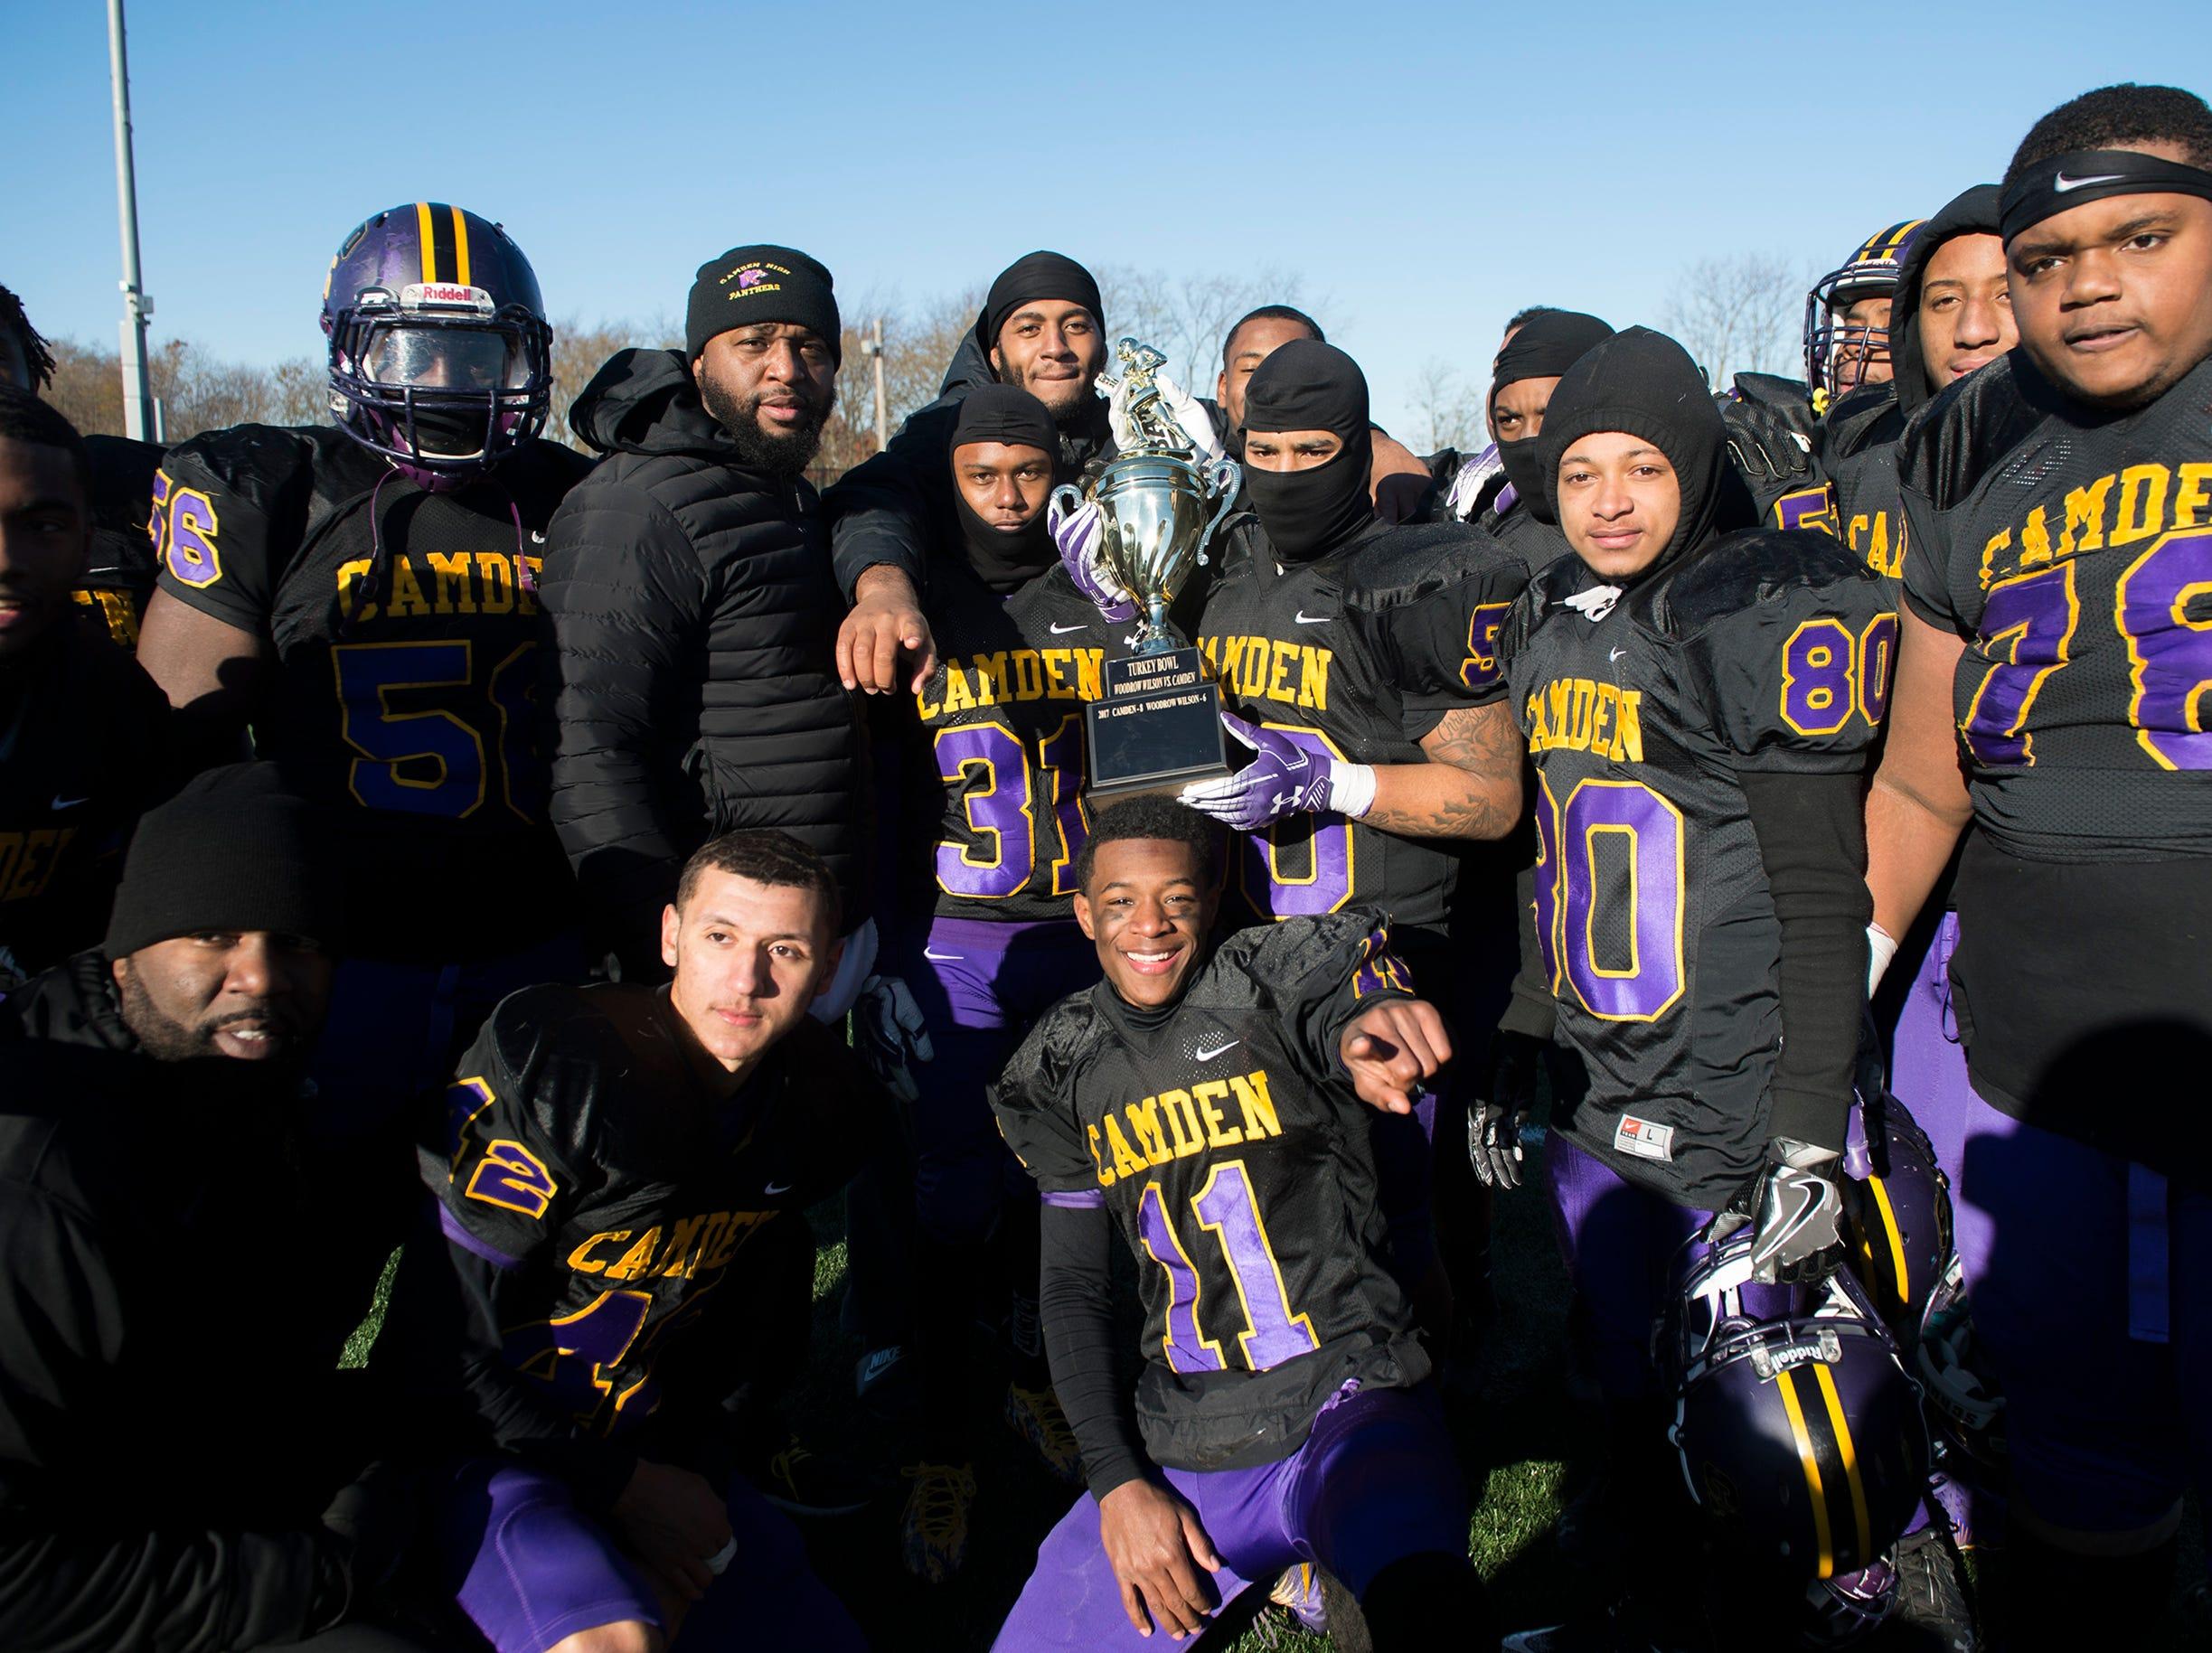 Camden poses with their trophy following an annual Camden-Woodrow Wilson Thanksgiving game Thursday, Nov. 22, 2018 in Camden, N.J. Camden won 39-28.